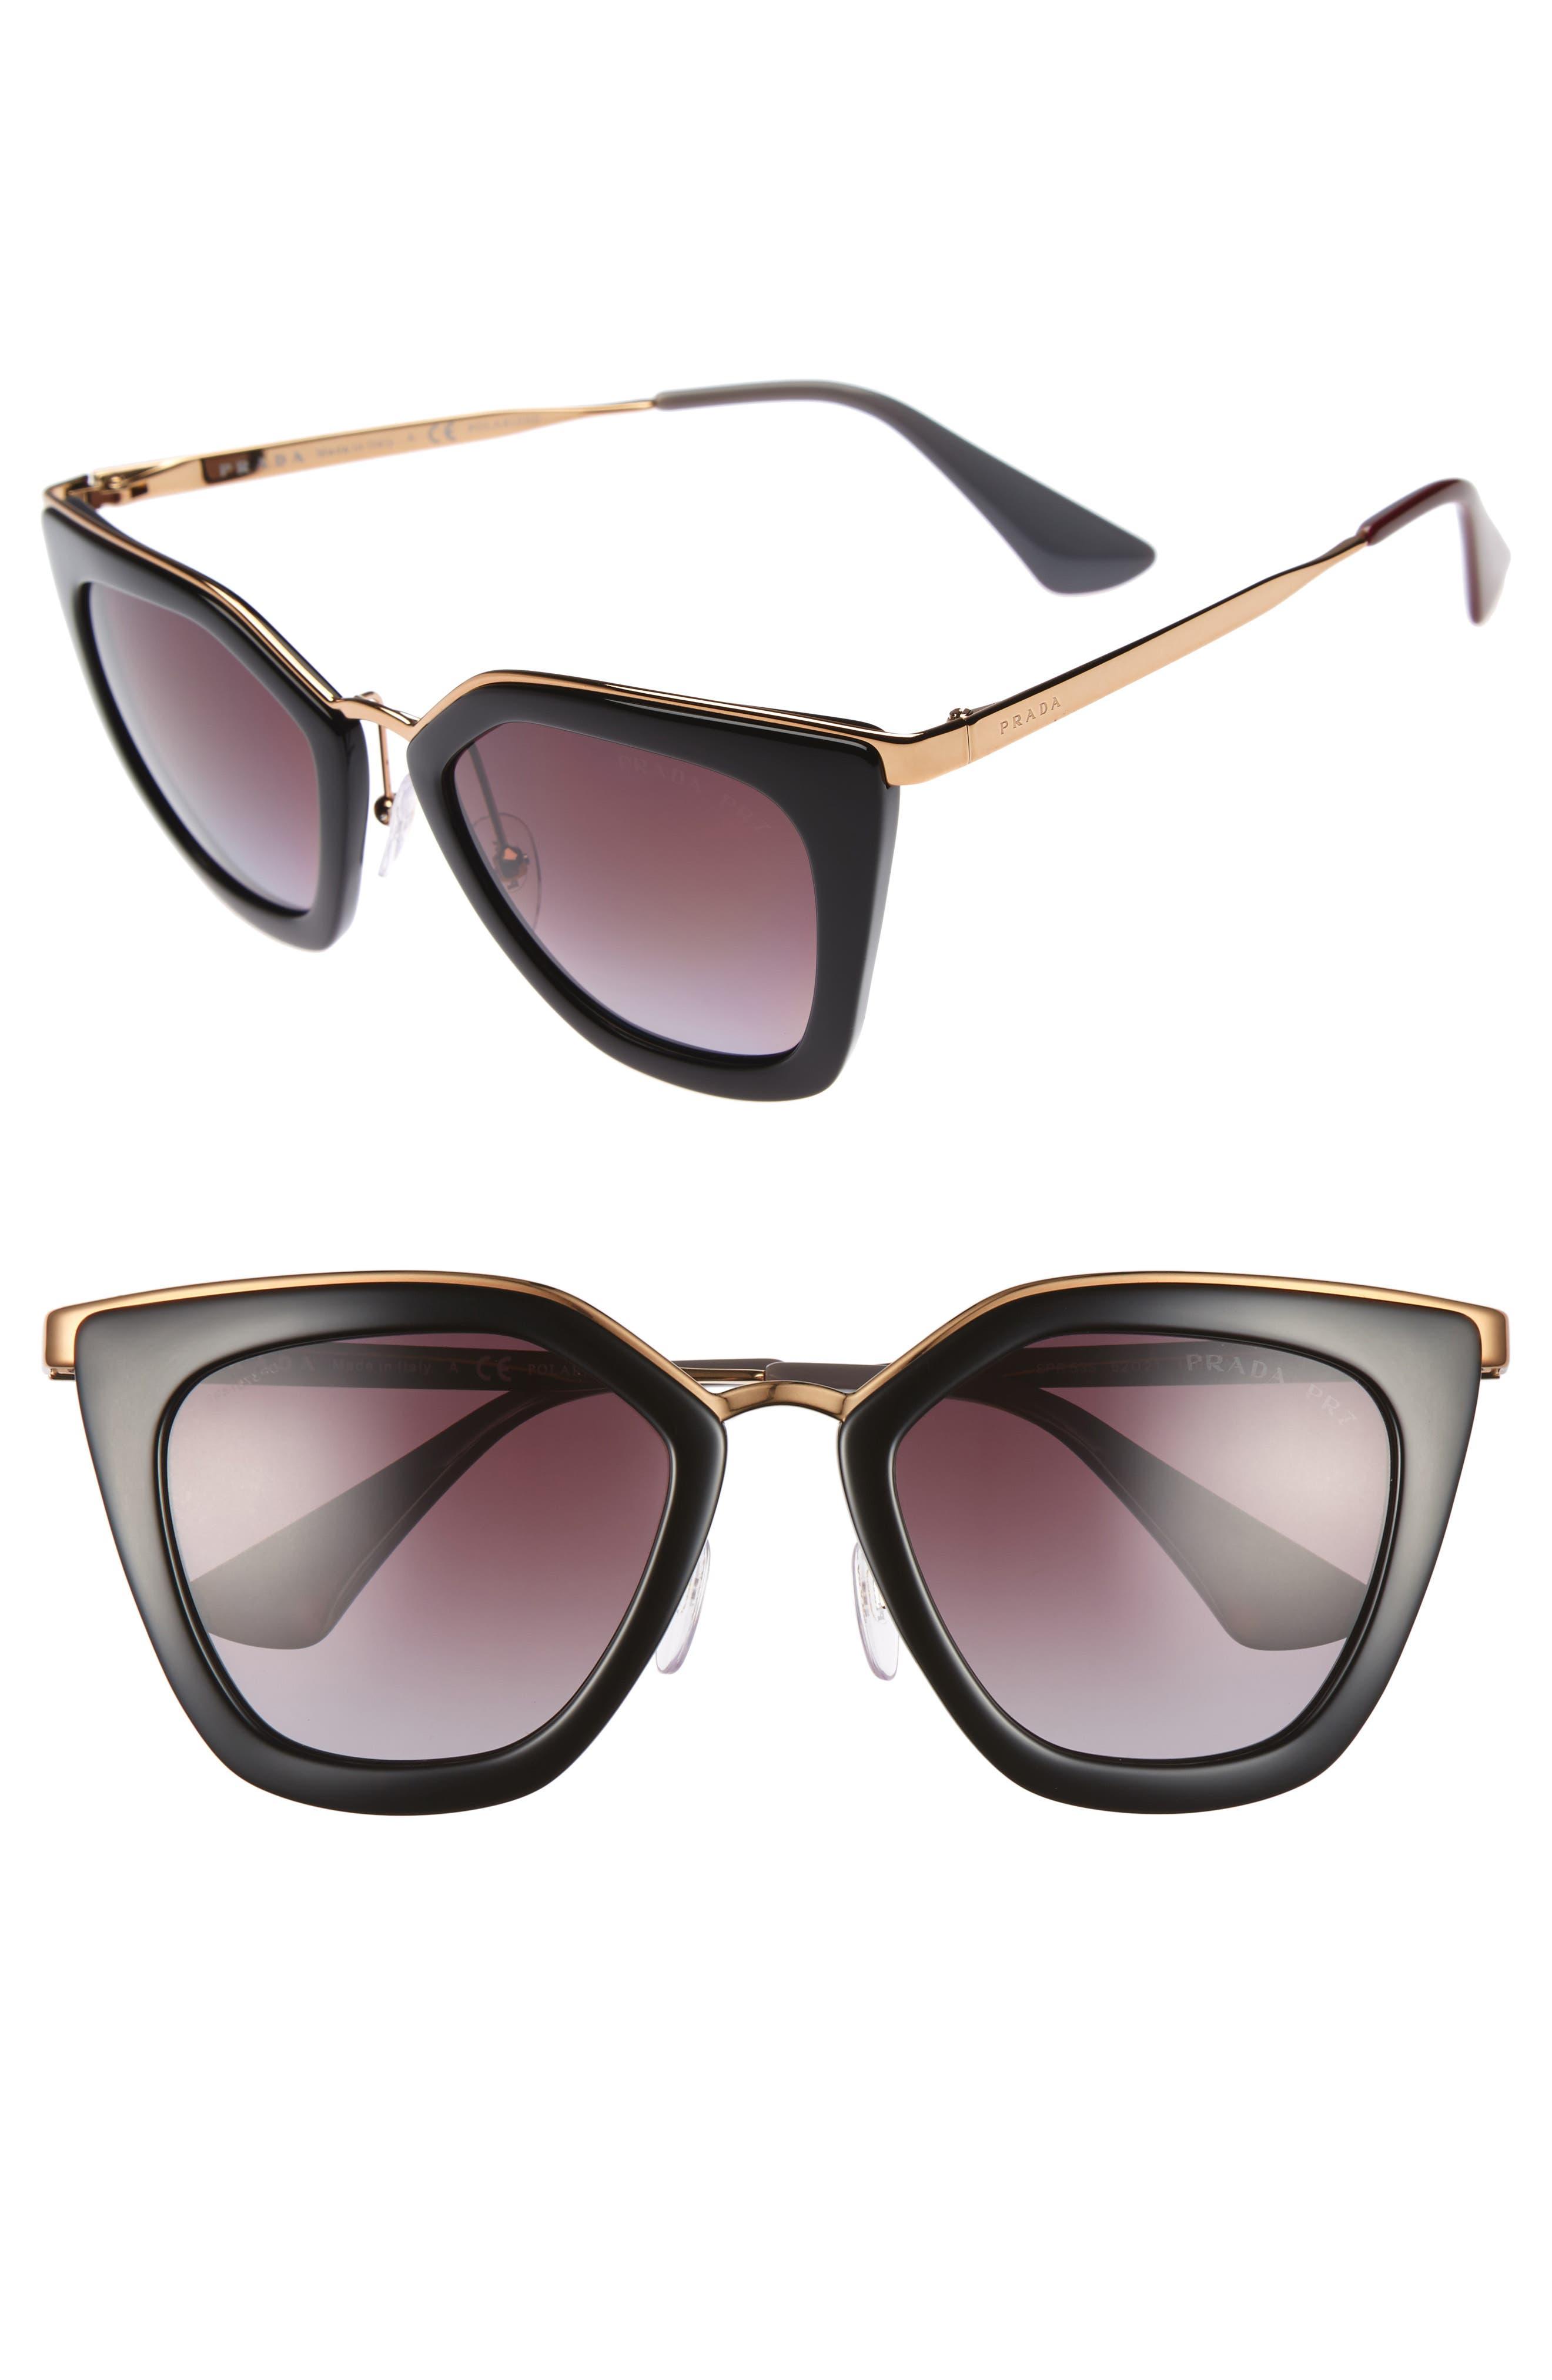 52mm Polarized Cat Eye Sunglasses,                         Main,                         color, Black Polar